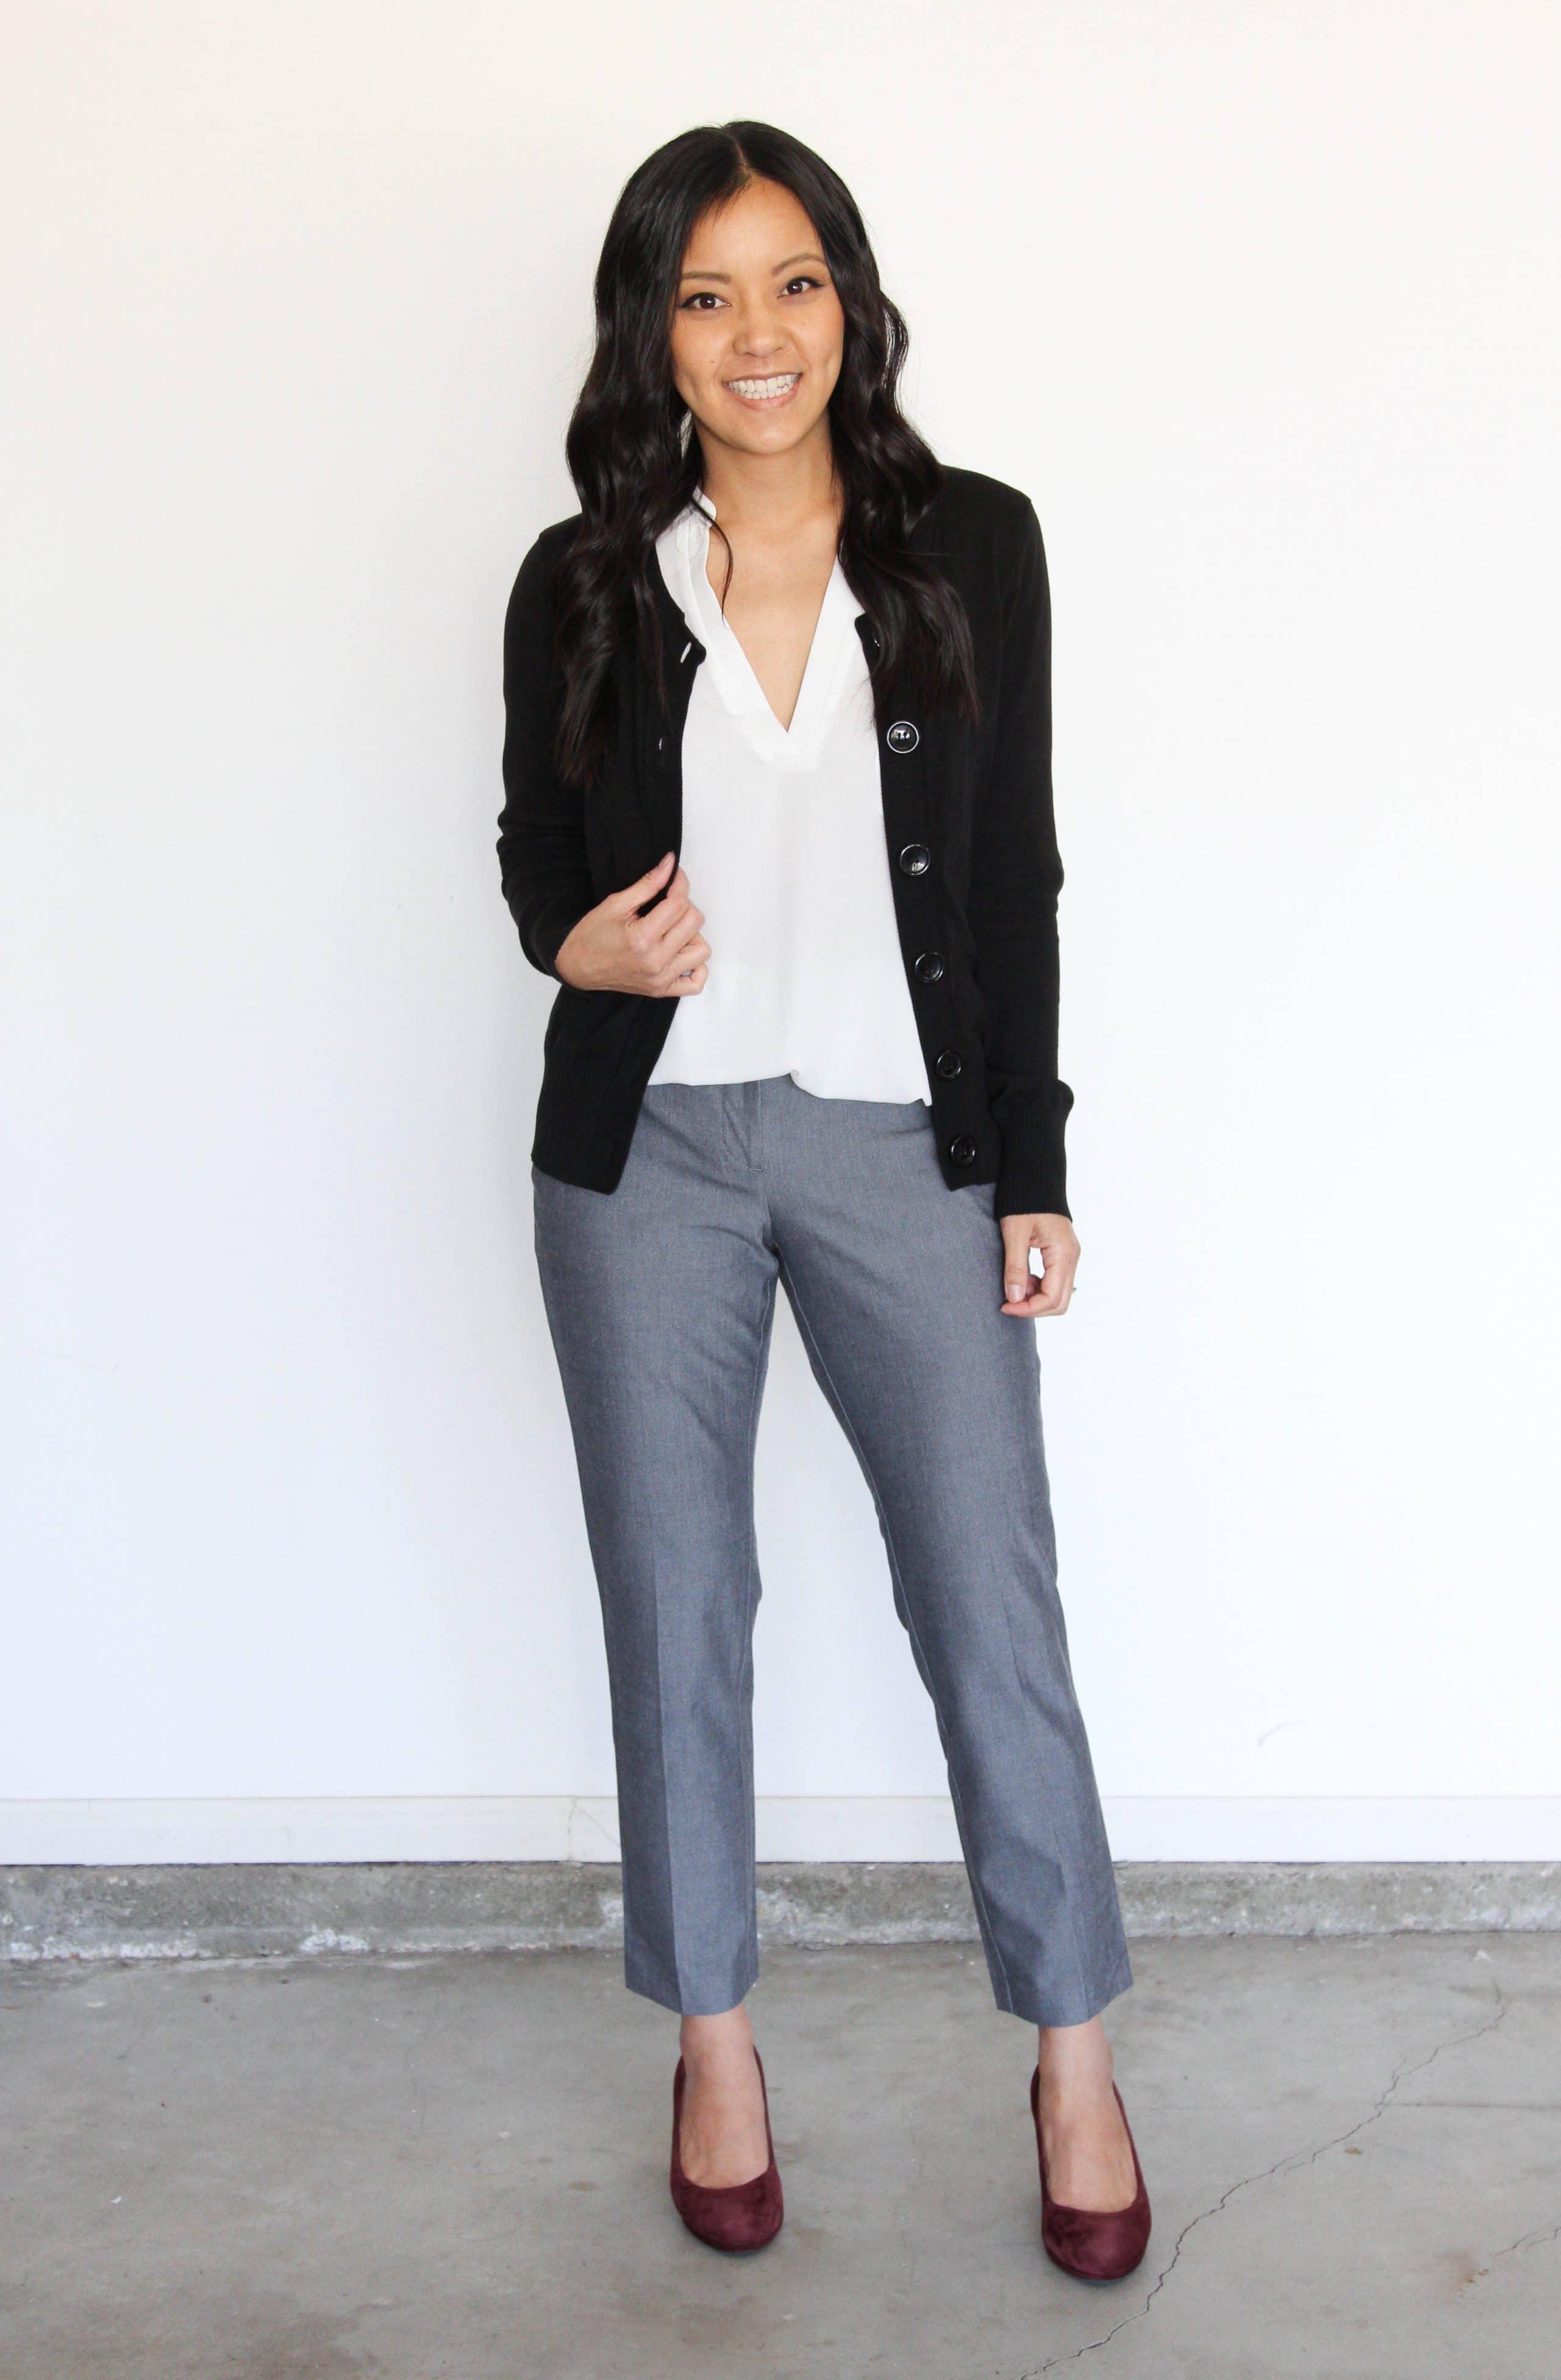 Black Cardigan + White Lush Top + Gray Pants + Maroon Pumps